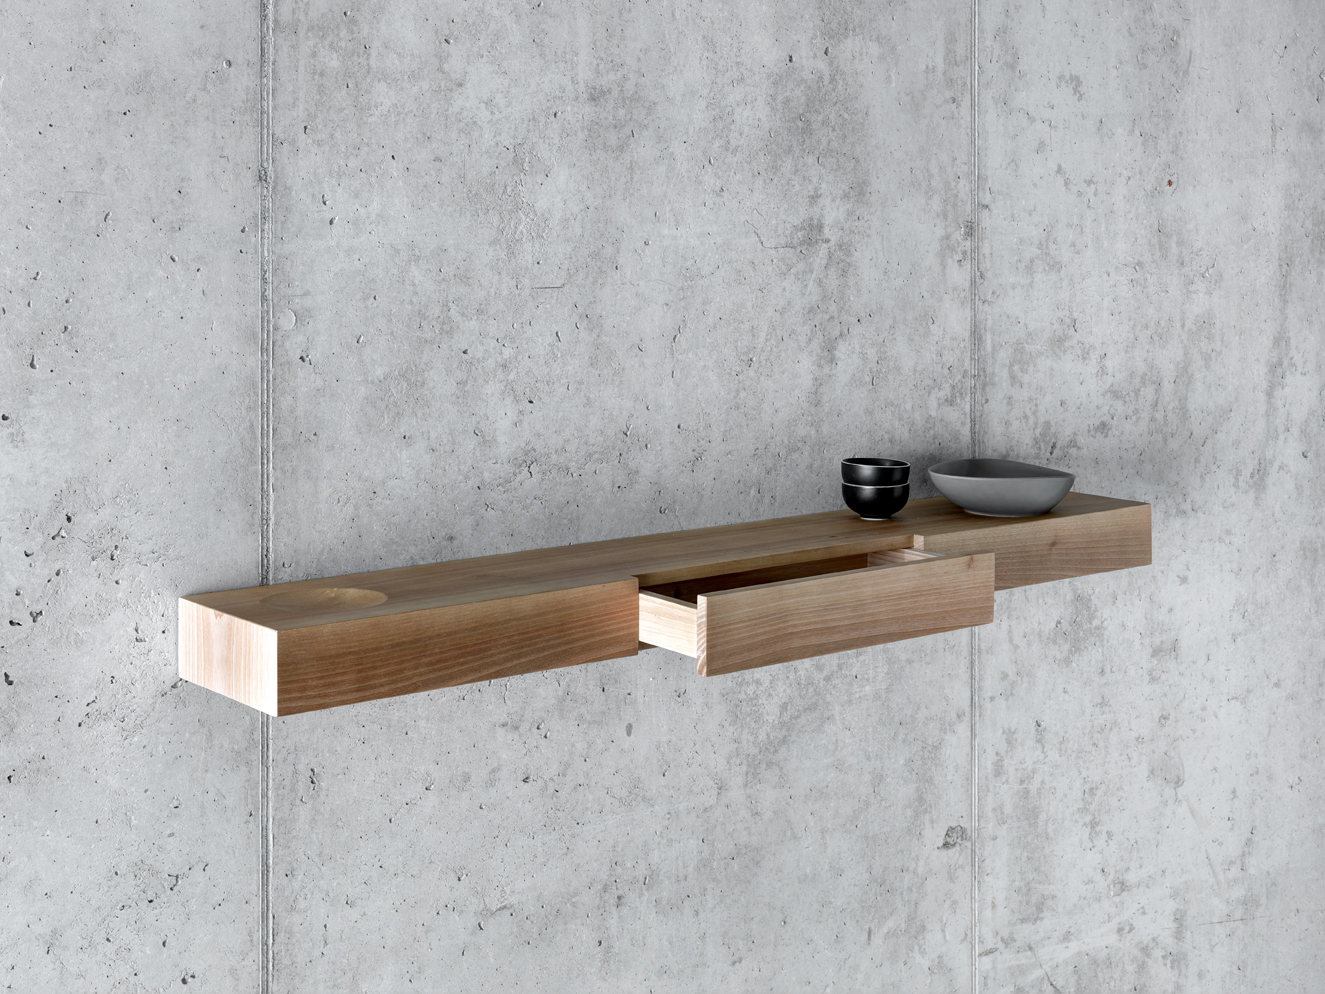 walnut wall shelf b u00c0uti by fioroni design pasquini tranfa walnut wall mounted shelves walnut wall shelves floating